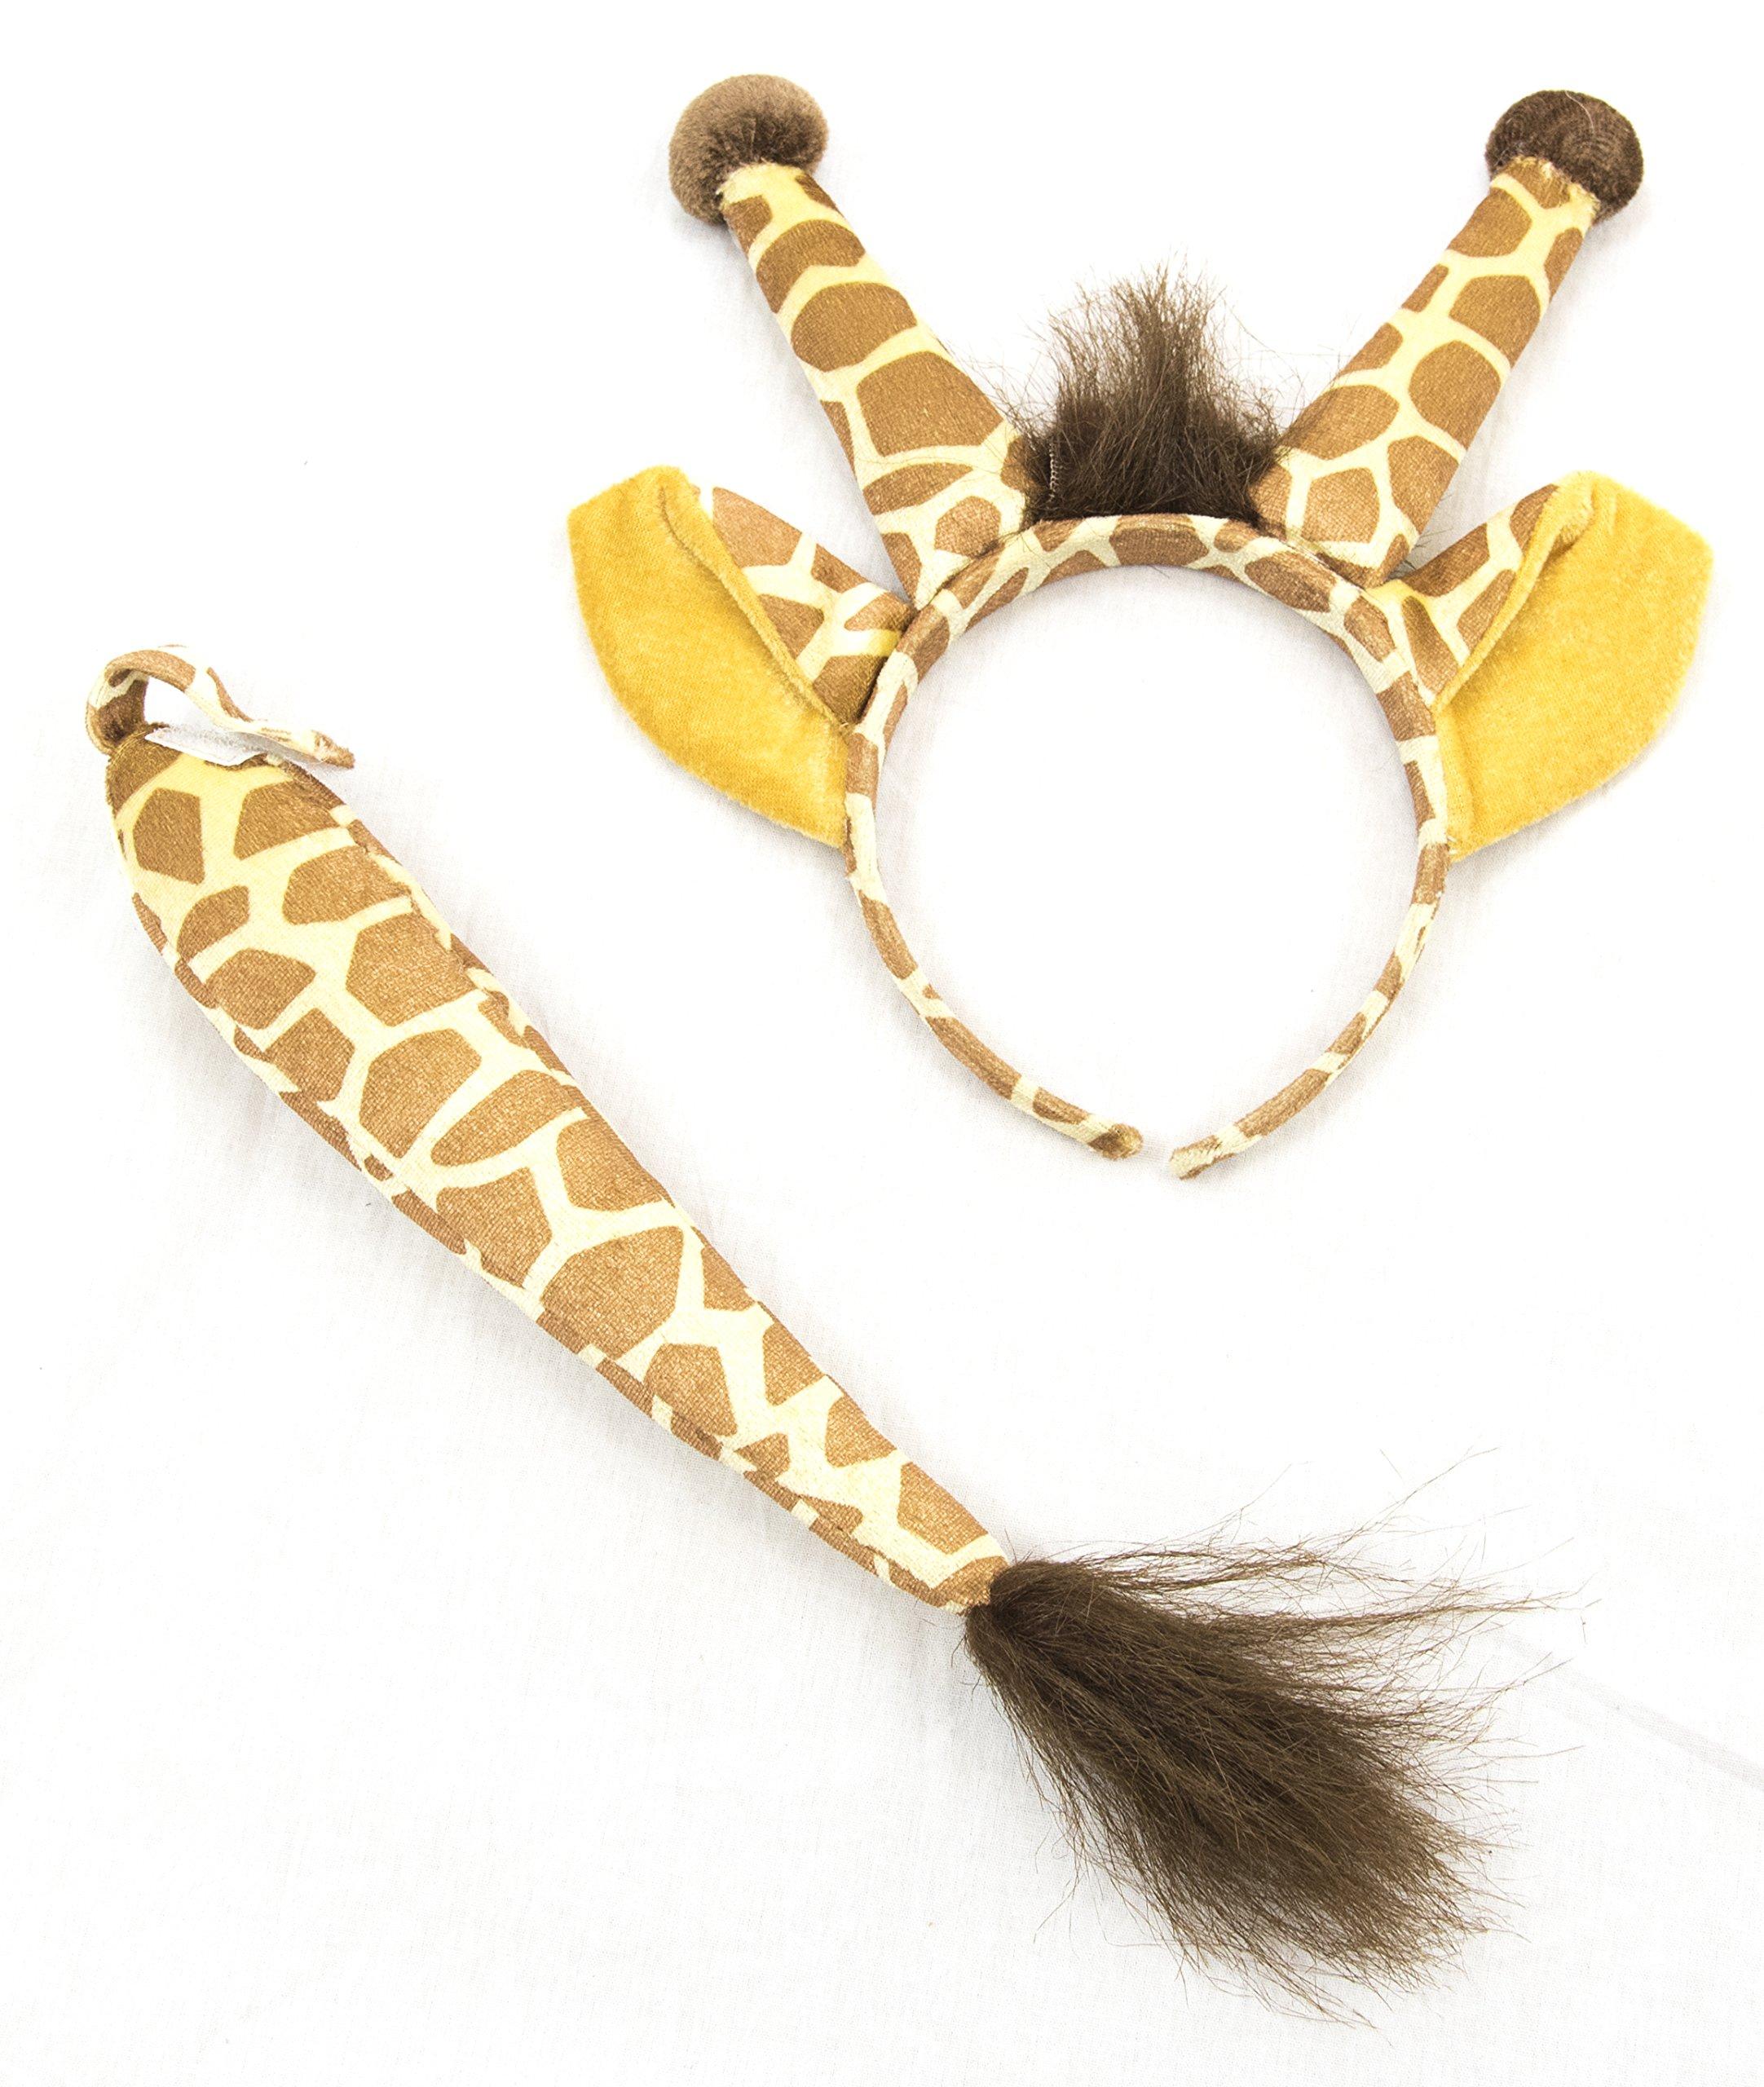 Giraffe Ears & Tail Costume Accessory Set